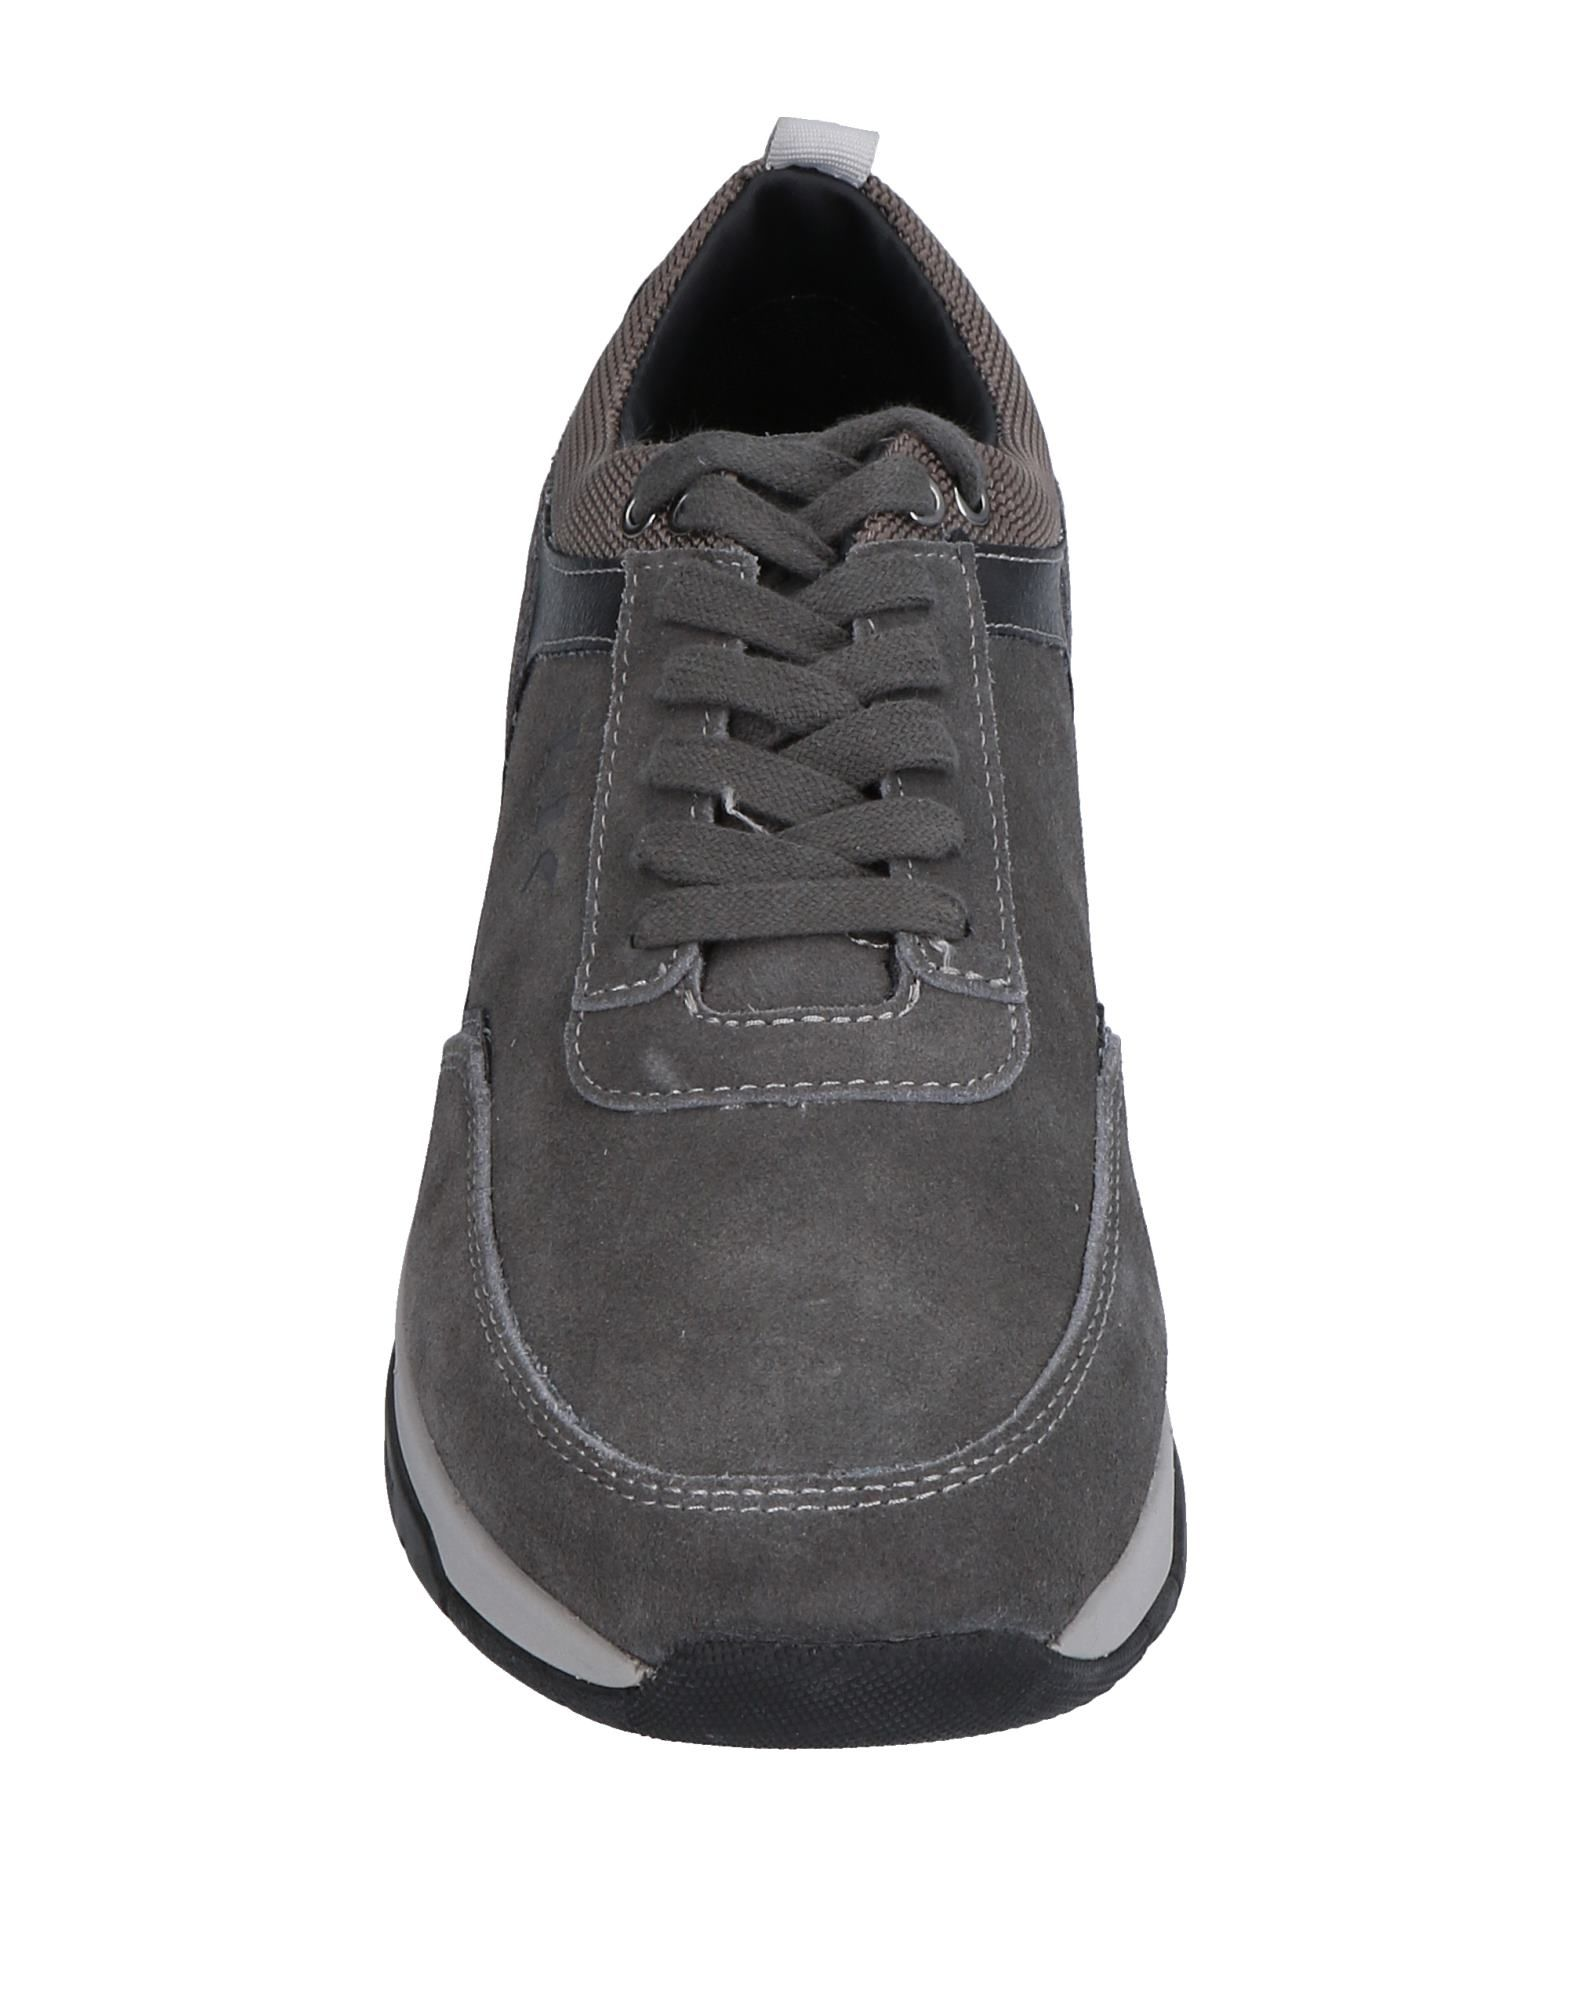 Rabatt echte  Schuhe Lumberjack Sneakers Herren  echte 11514637LO 201e5e